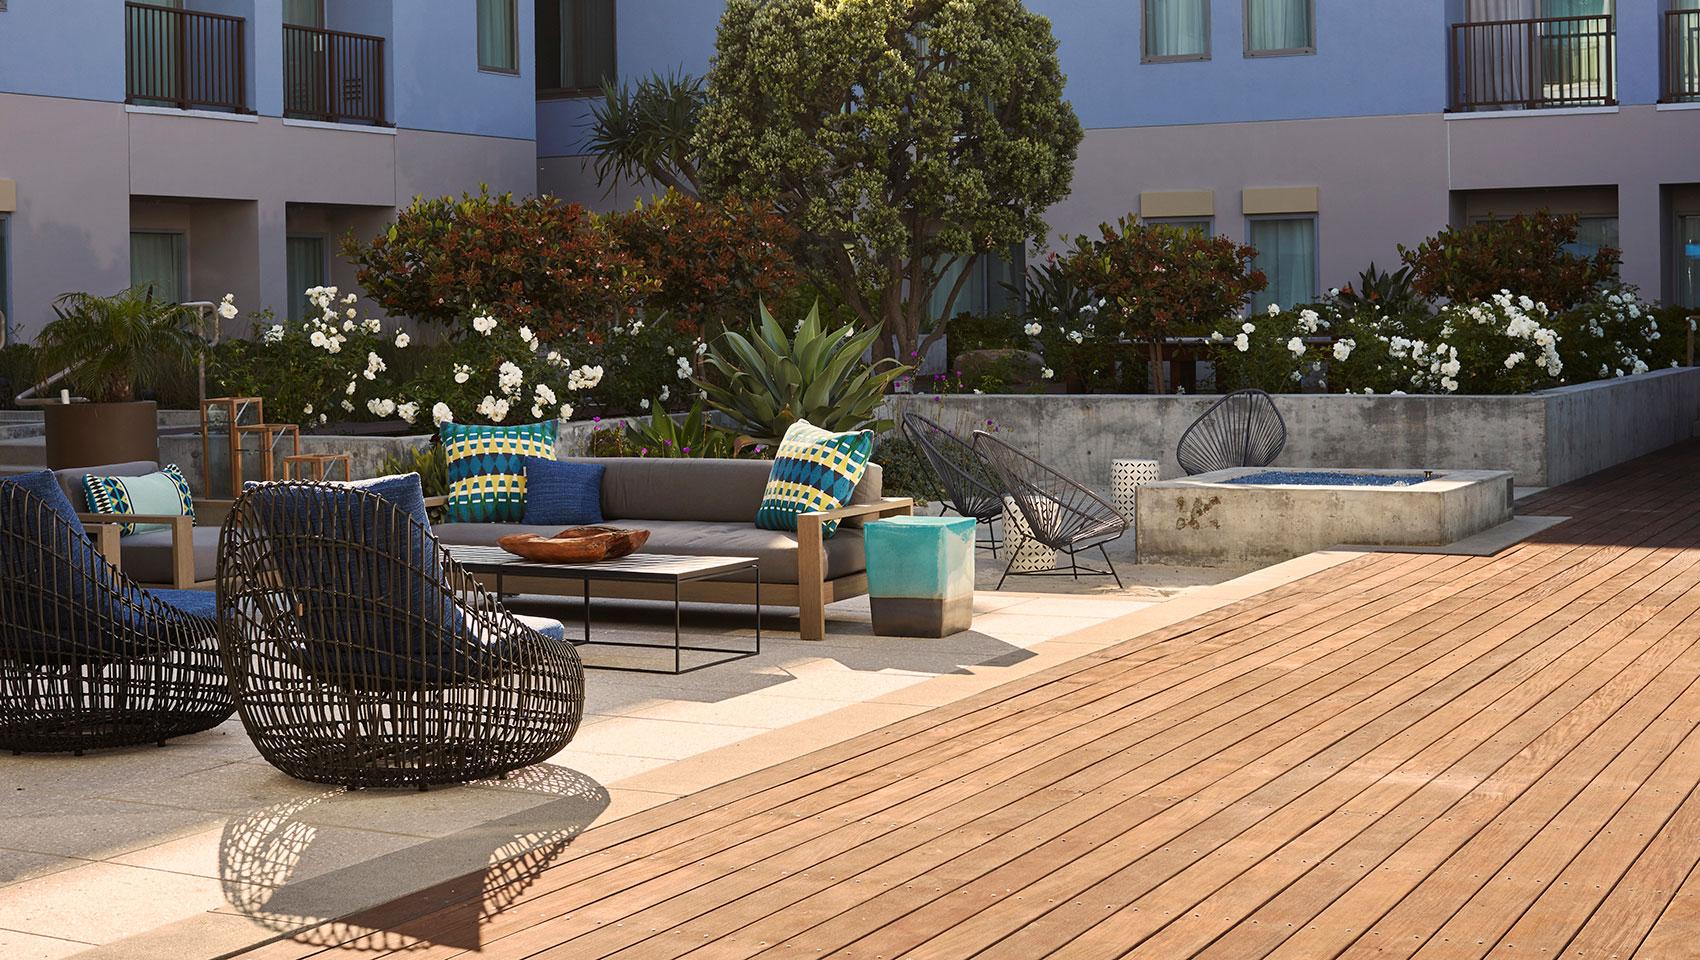 boutique huntington beach resort photos kimpton. Black Bedroom Furniture Sets. Home Design Ideas